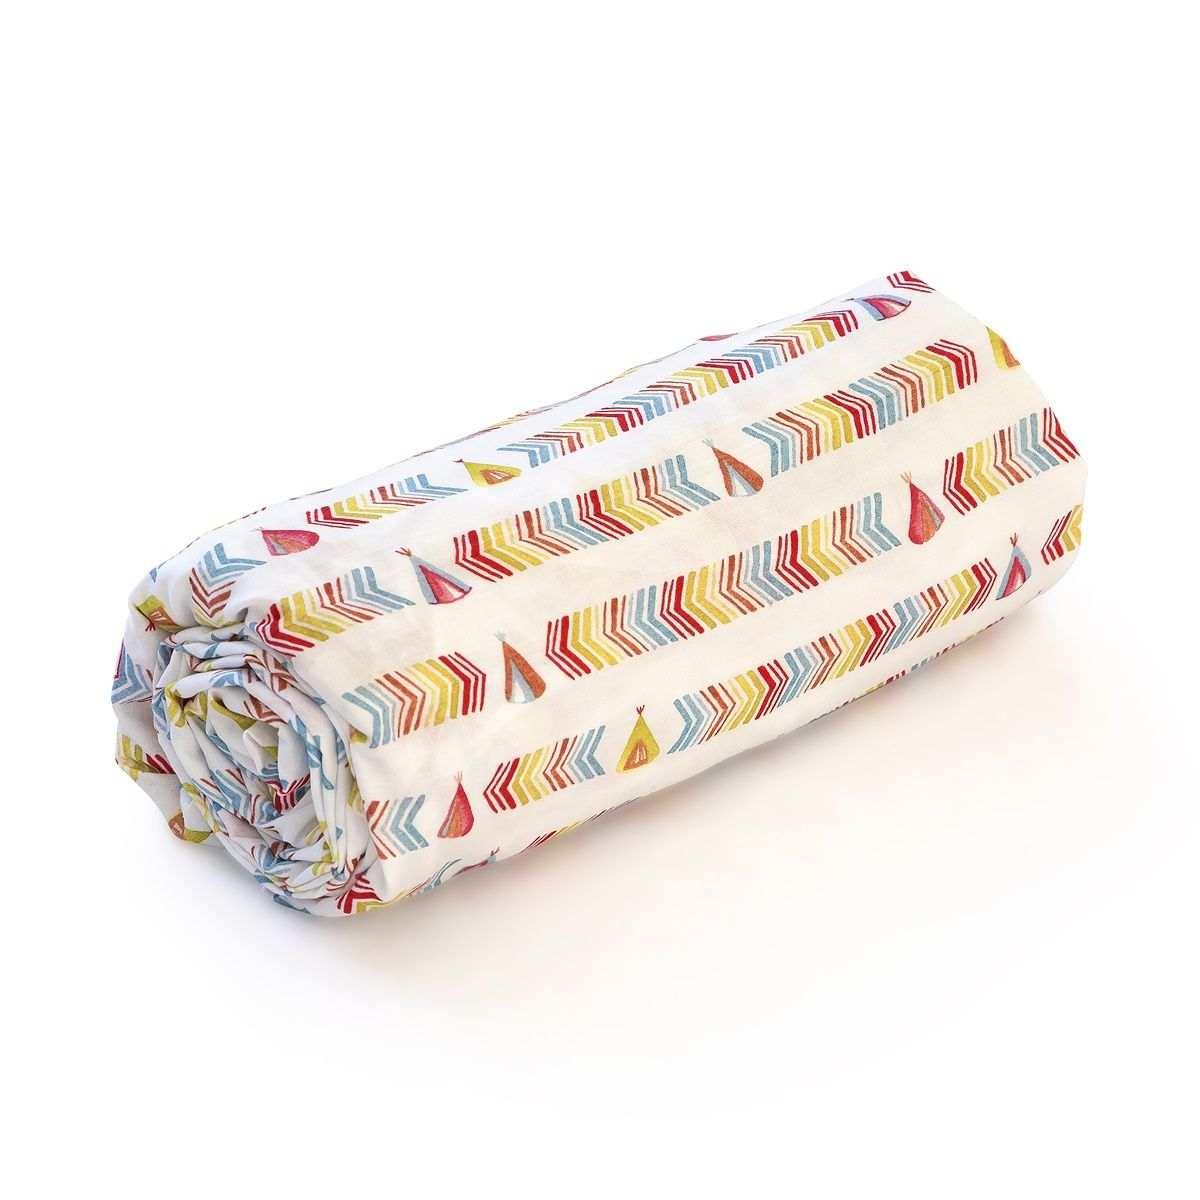 Fitted Sheet Tipi   Bed linen   Tradition des Vosges